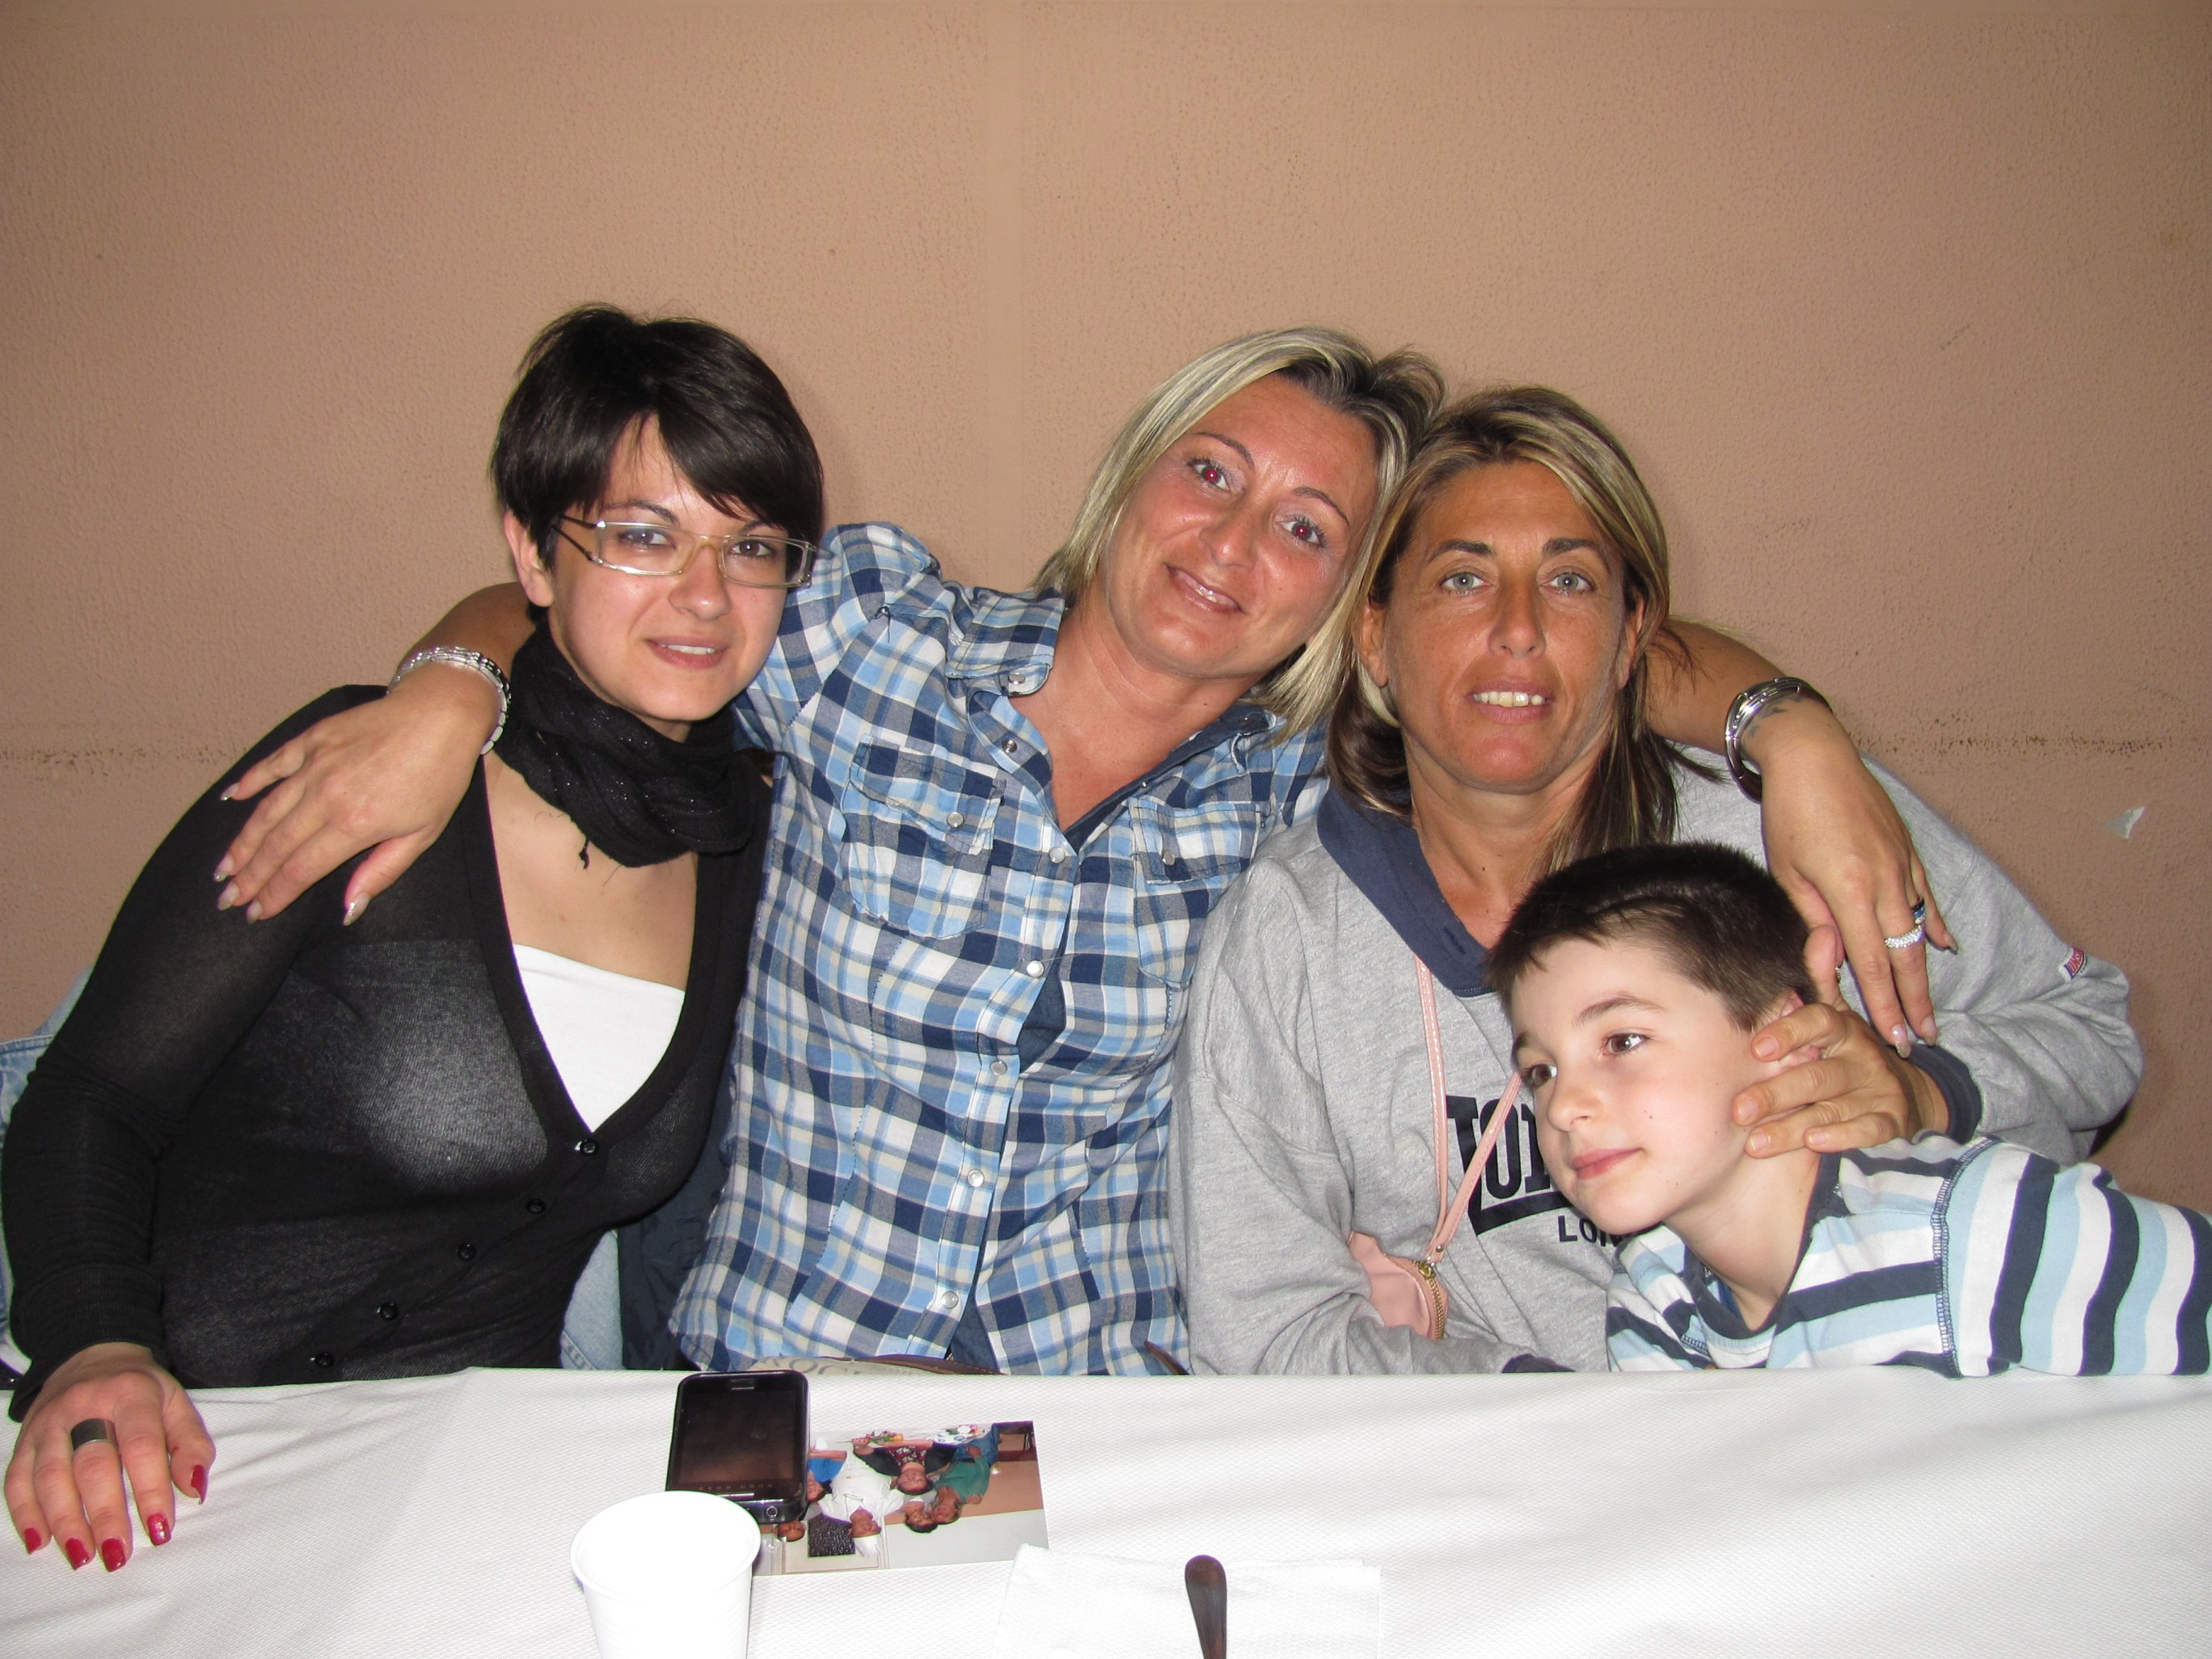 festa_madonna_2012-05-27-21-45-49